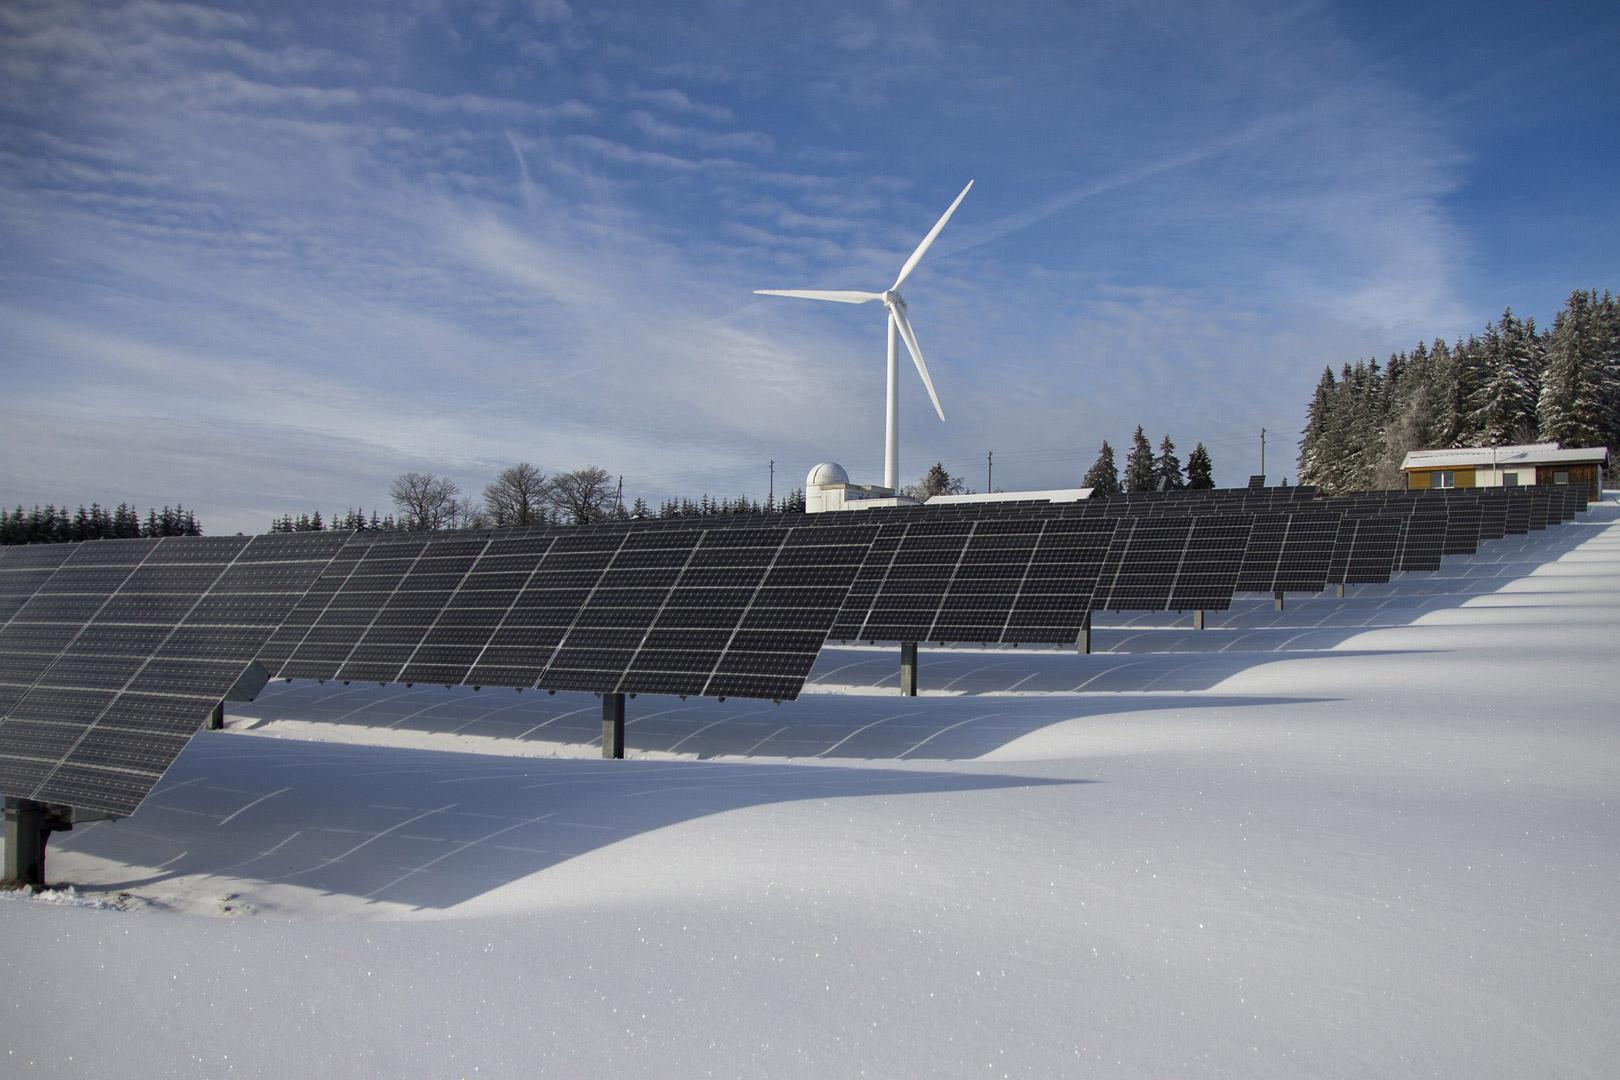 energie eolien solaire station montagne - Accueil enair france - Accueil enair france